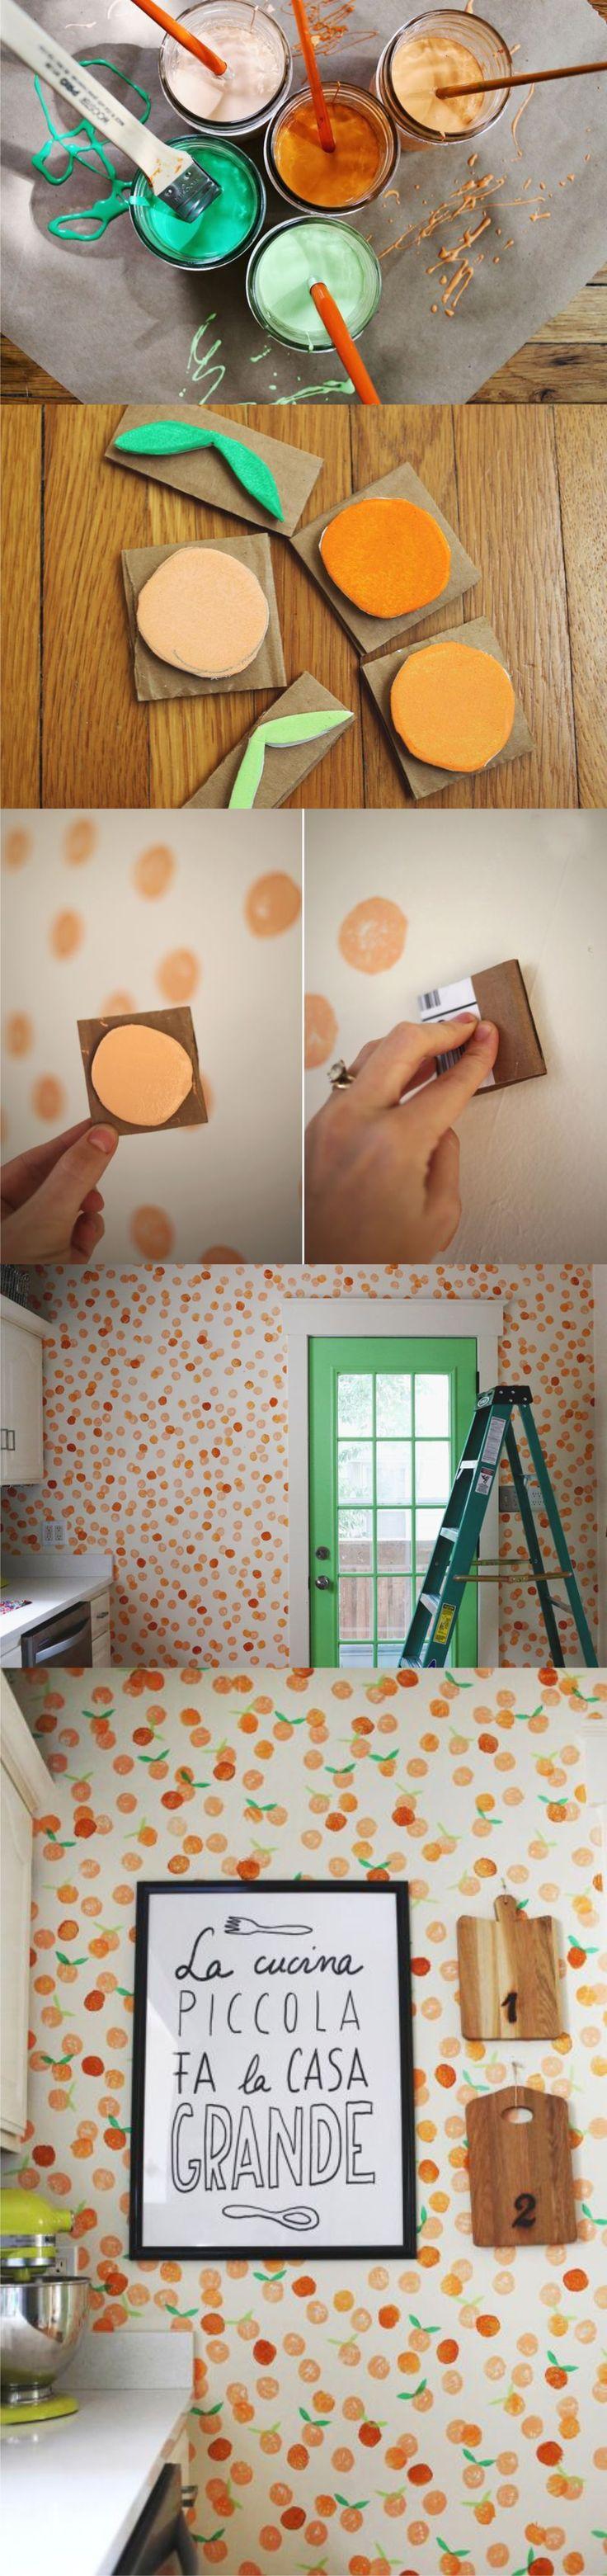 M s de 25 ideas incre bles sobre pintar las paredes de - Formas de pintar paredes con esponja ...